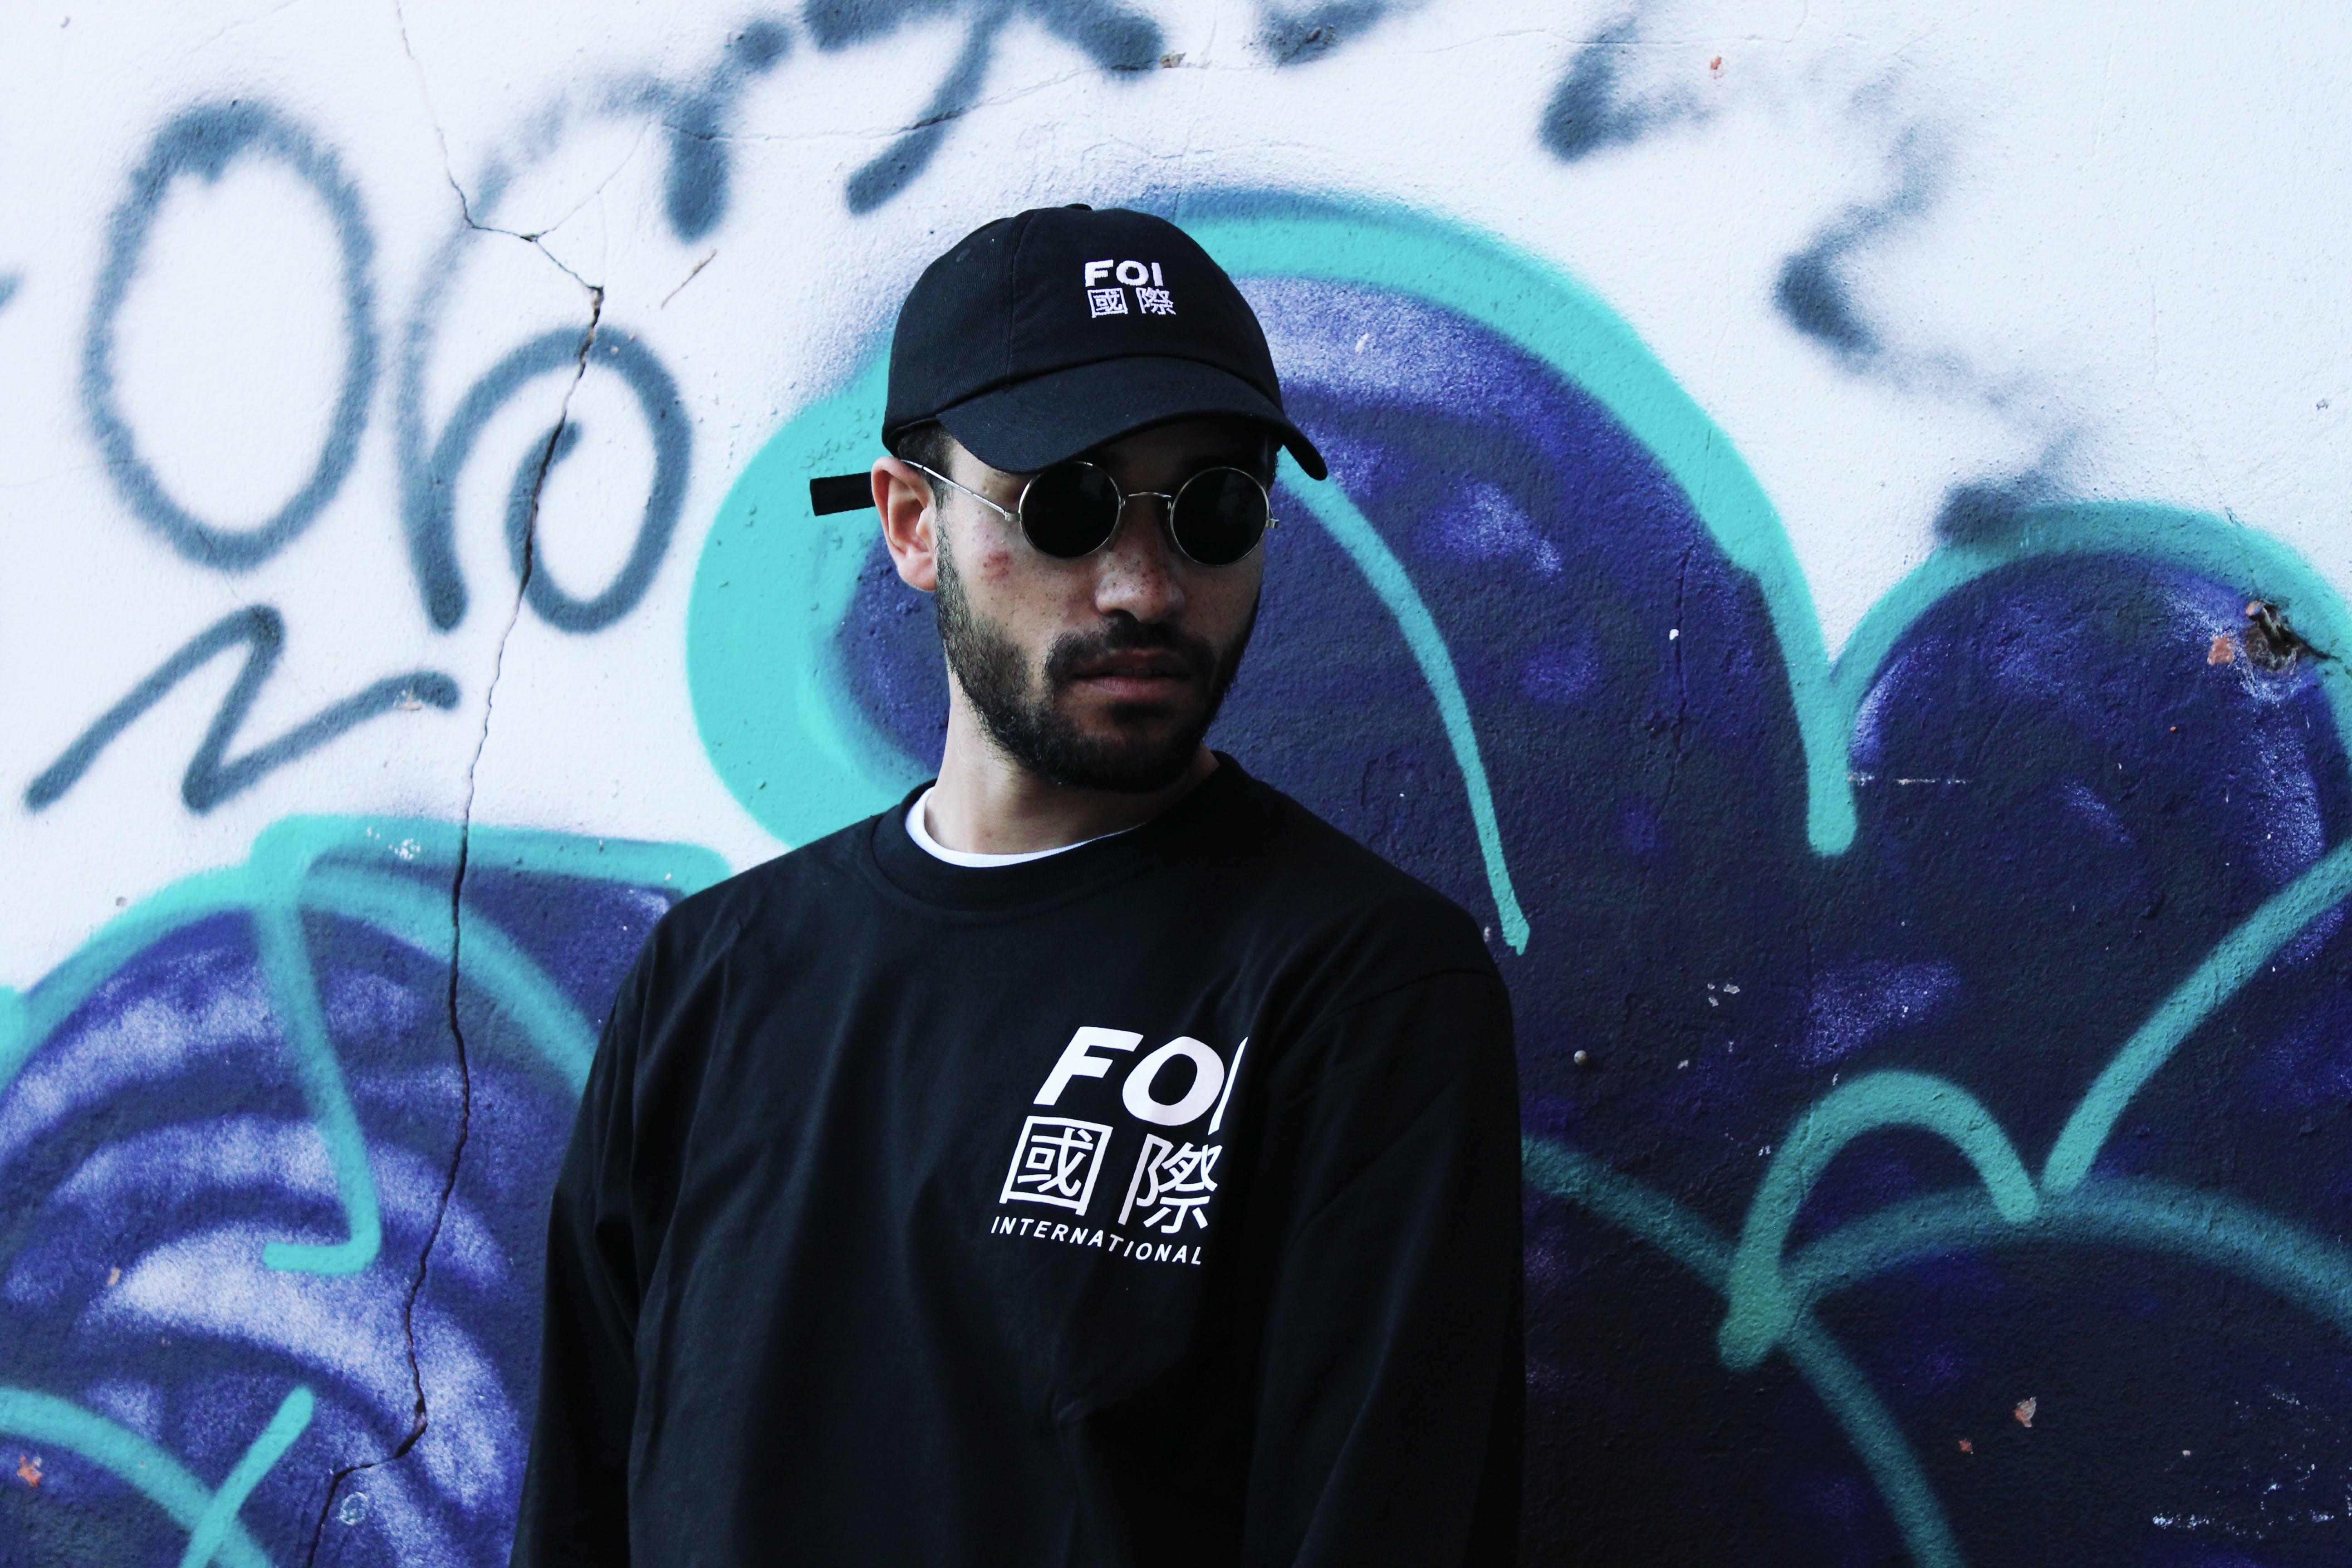 Photo of a Man Wearing Black Sunglasses